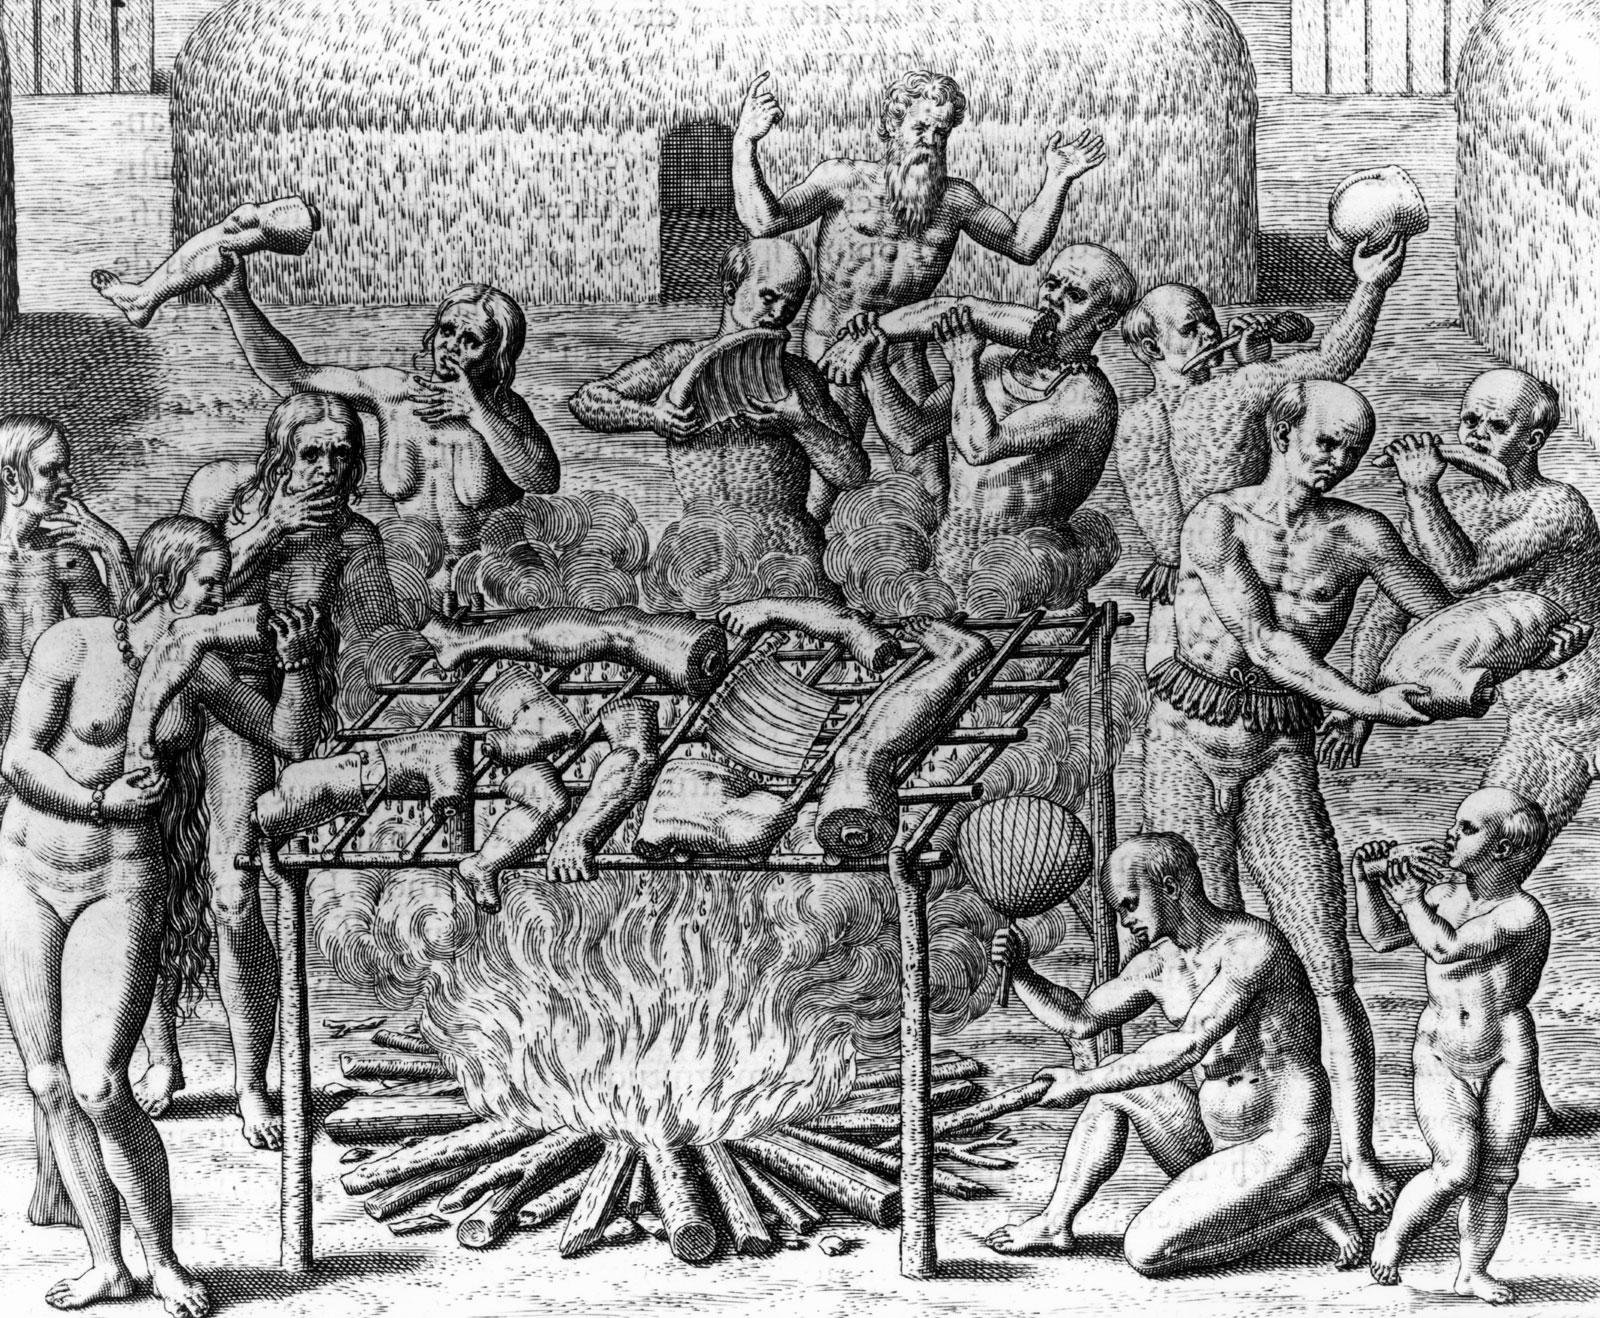 Human Cannibalism